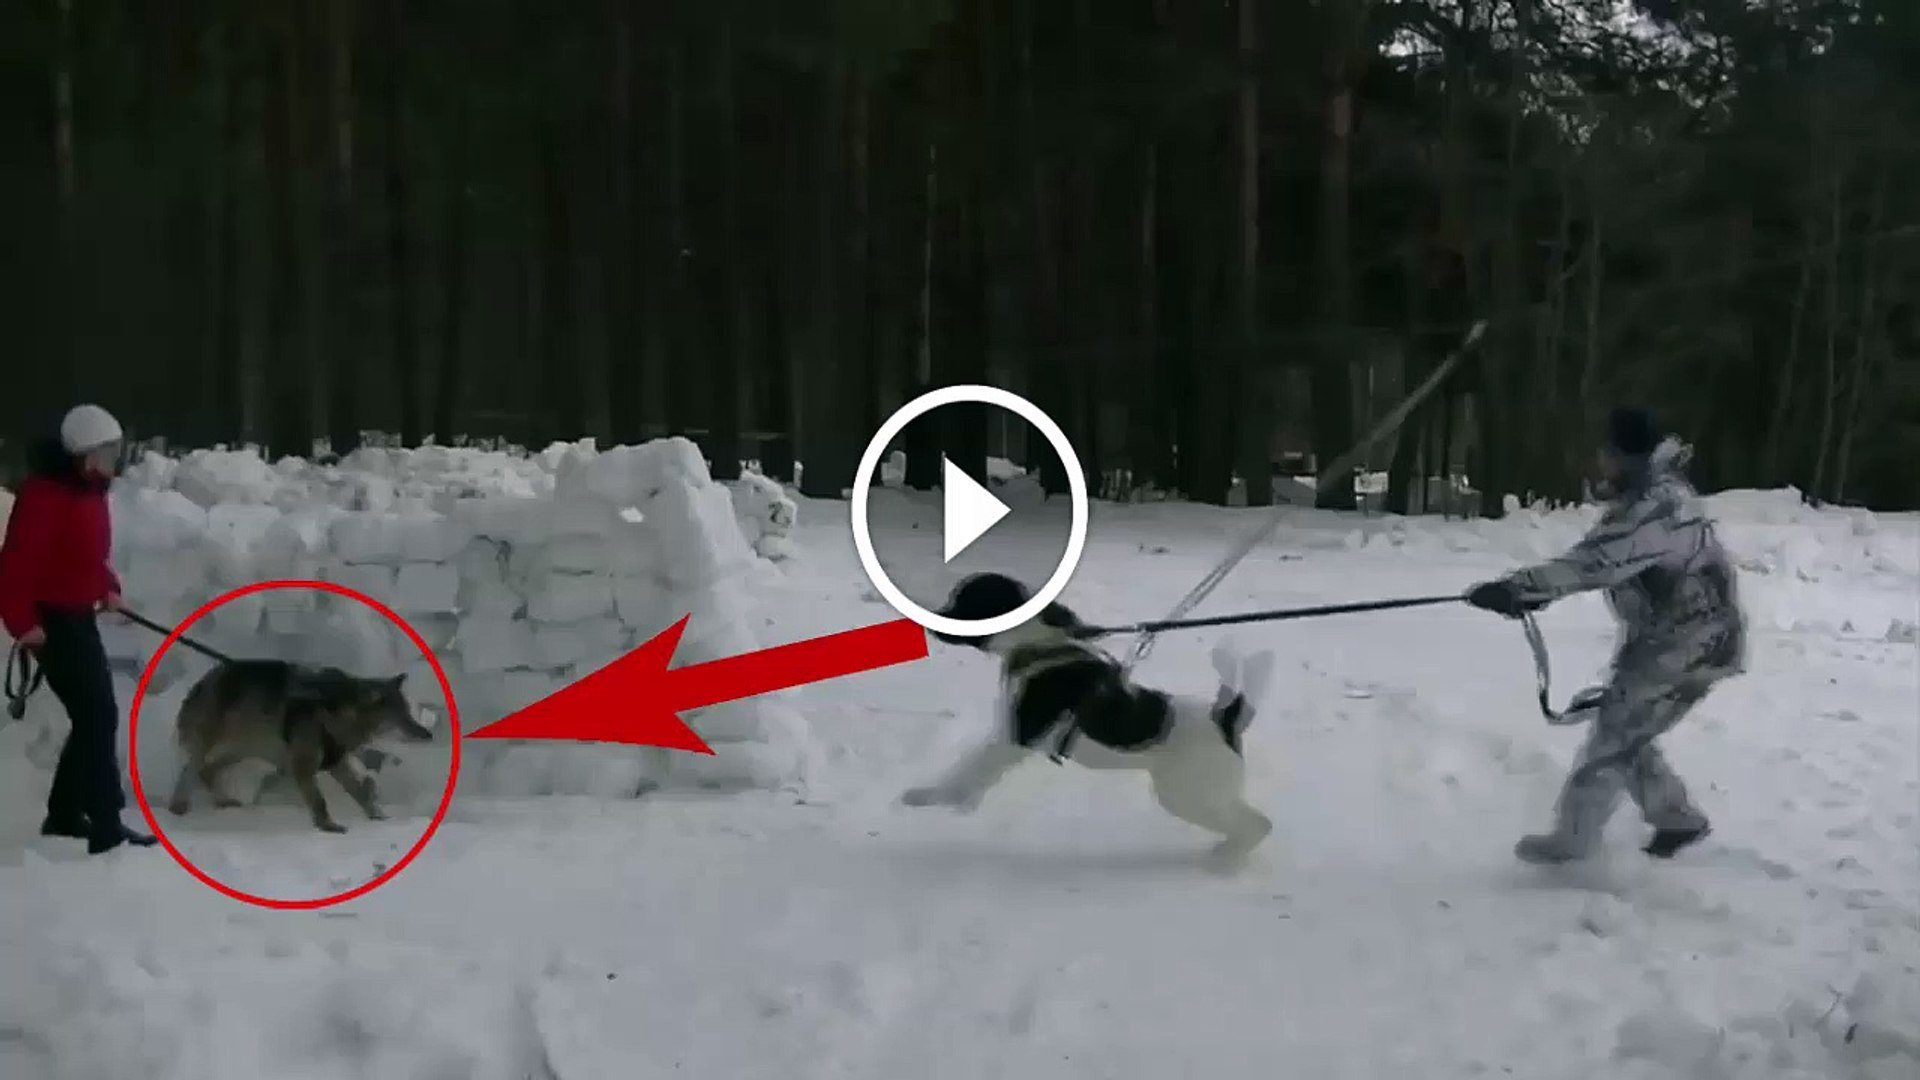 ALABAY COBAN KOPEGi vs KURT KARSILASMASI - ALABAI SHEPHERD DOG vs WOLF